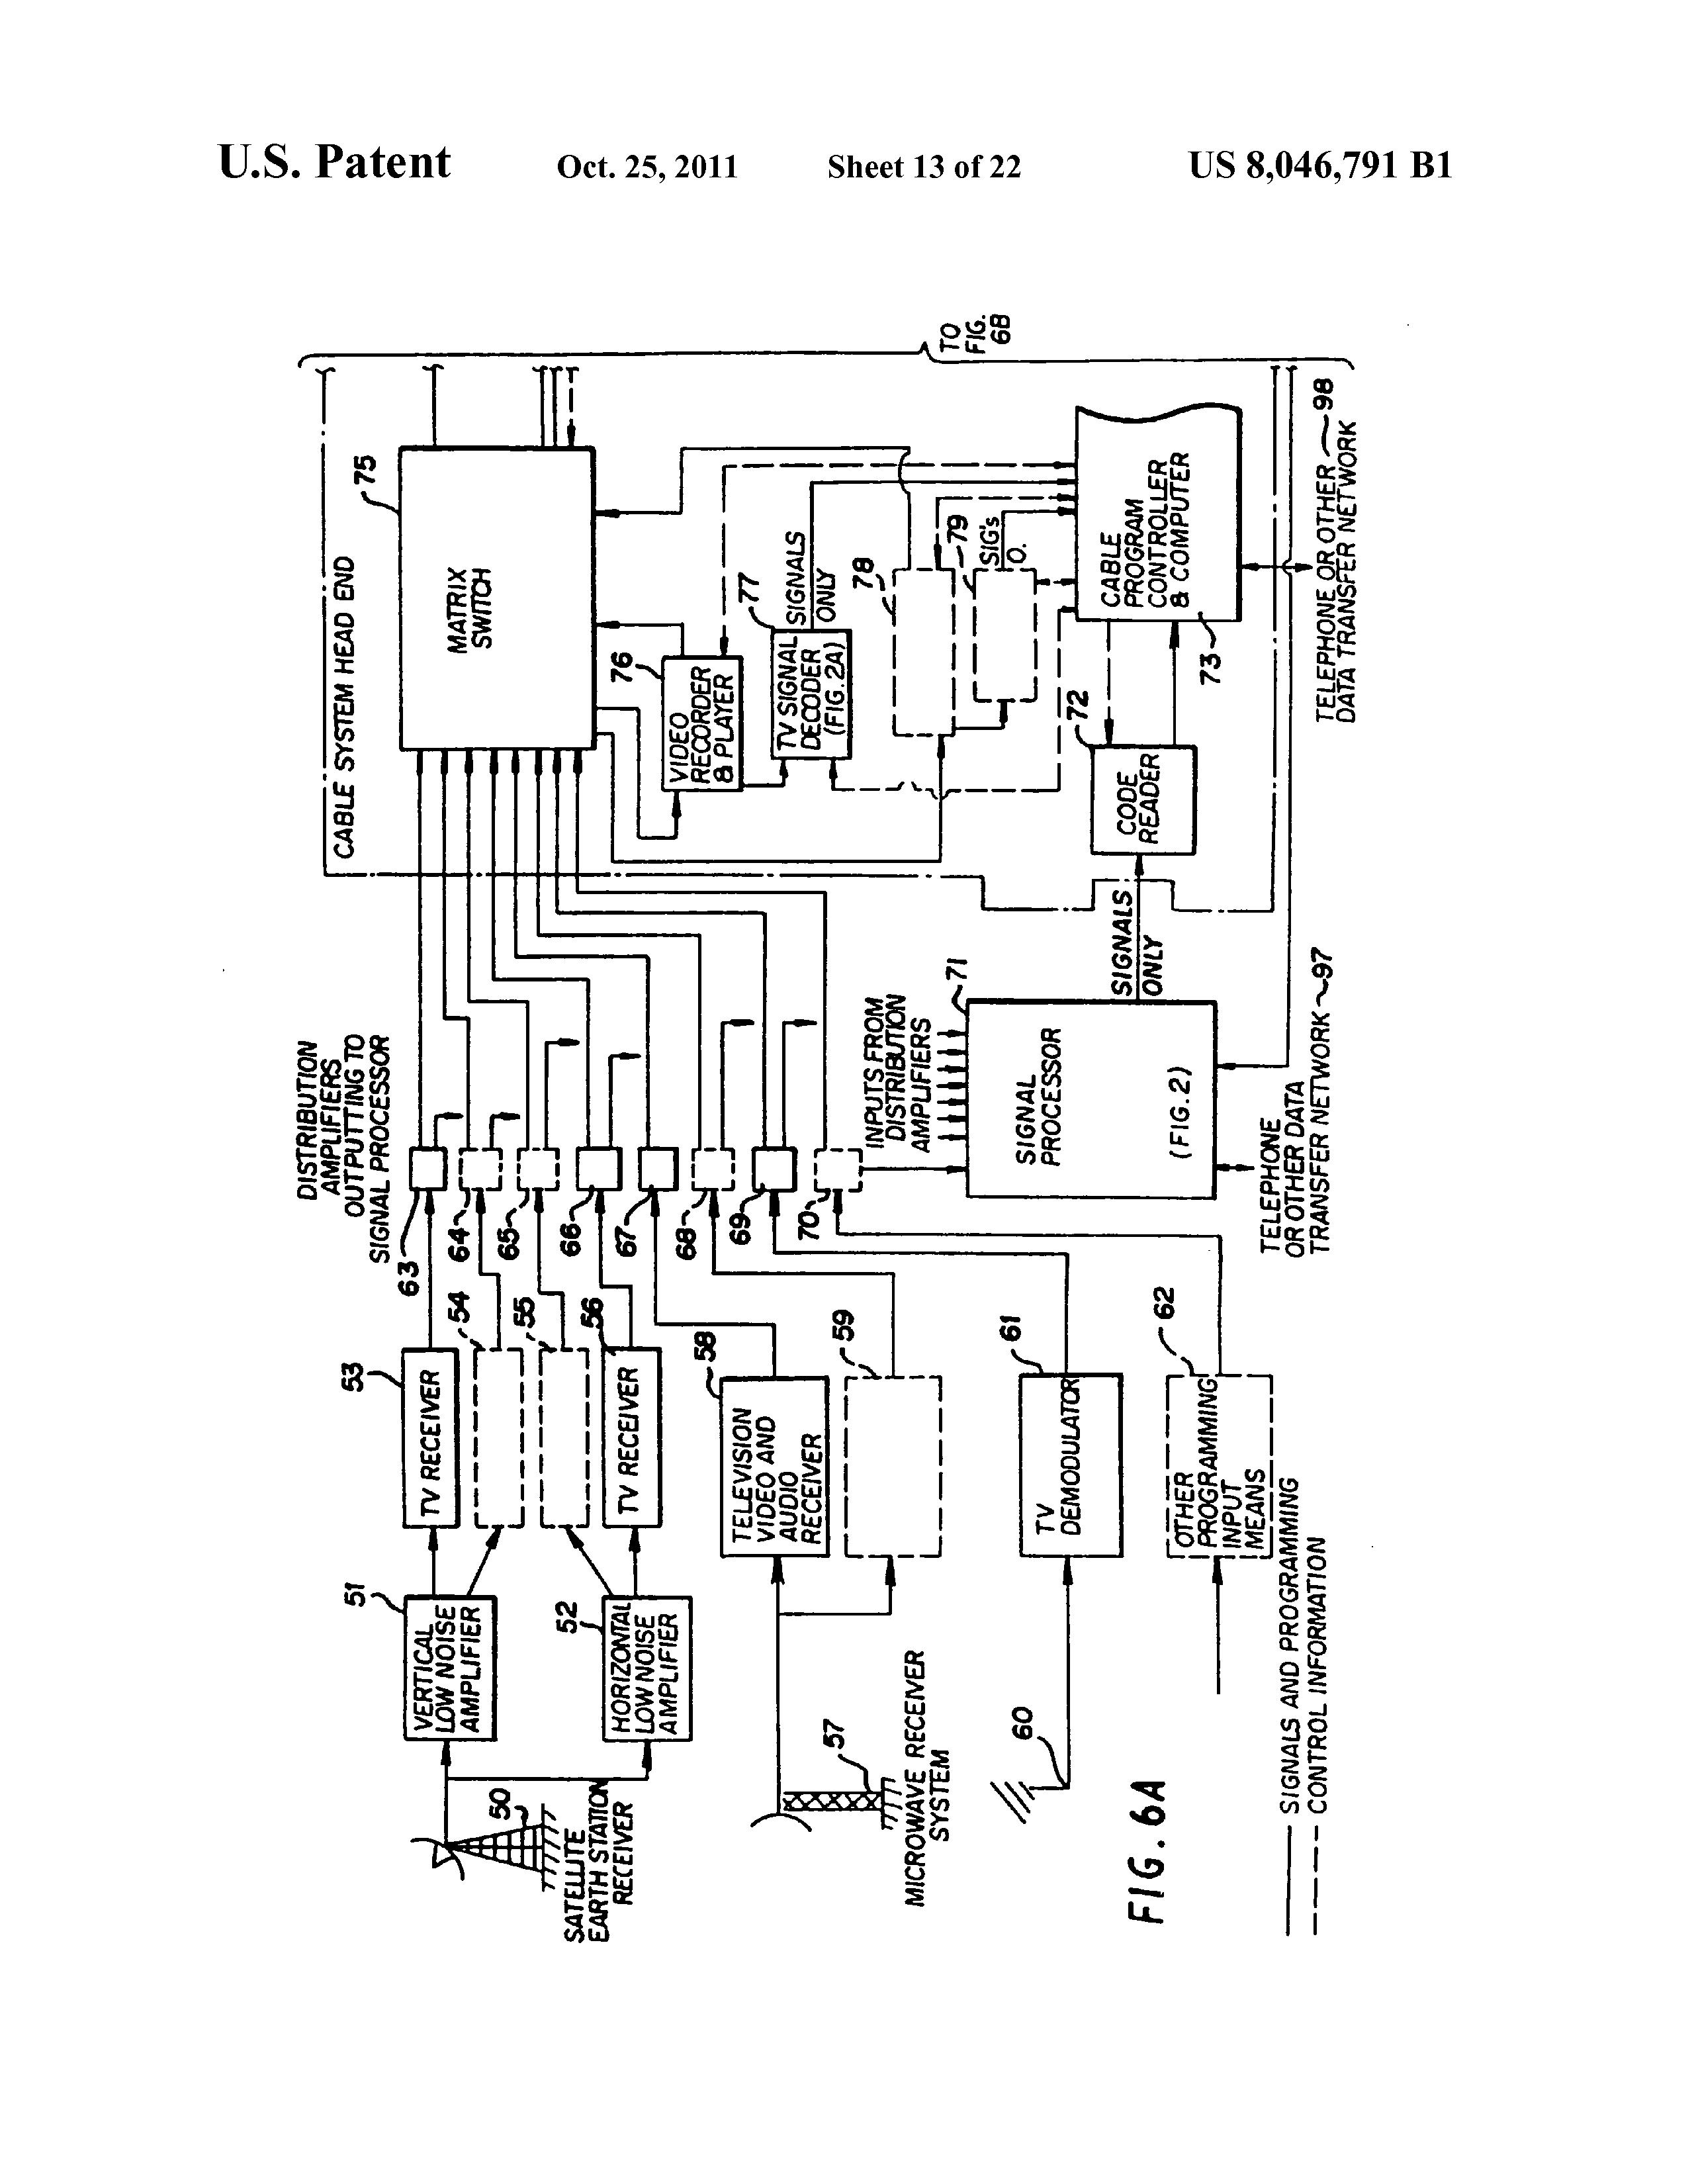 US8046791B1 - Signal processing apparatus and methods